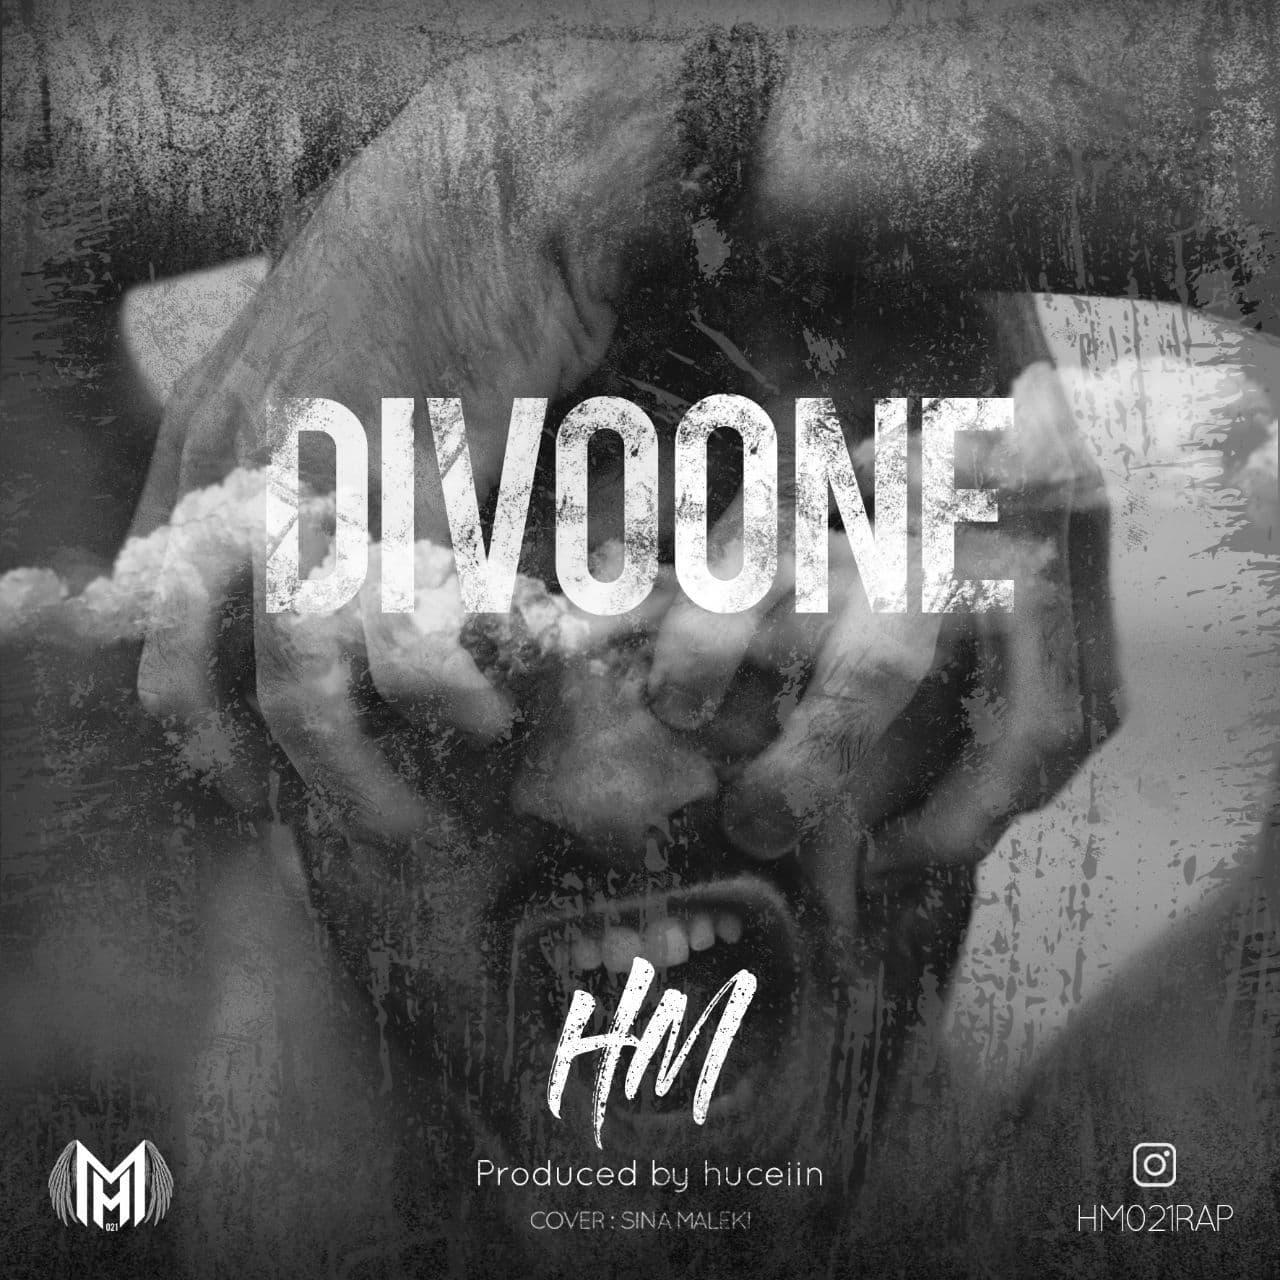 HM – Divoone